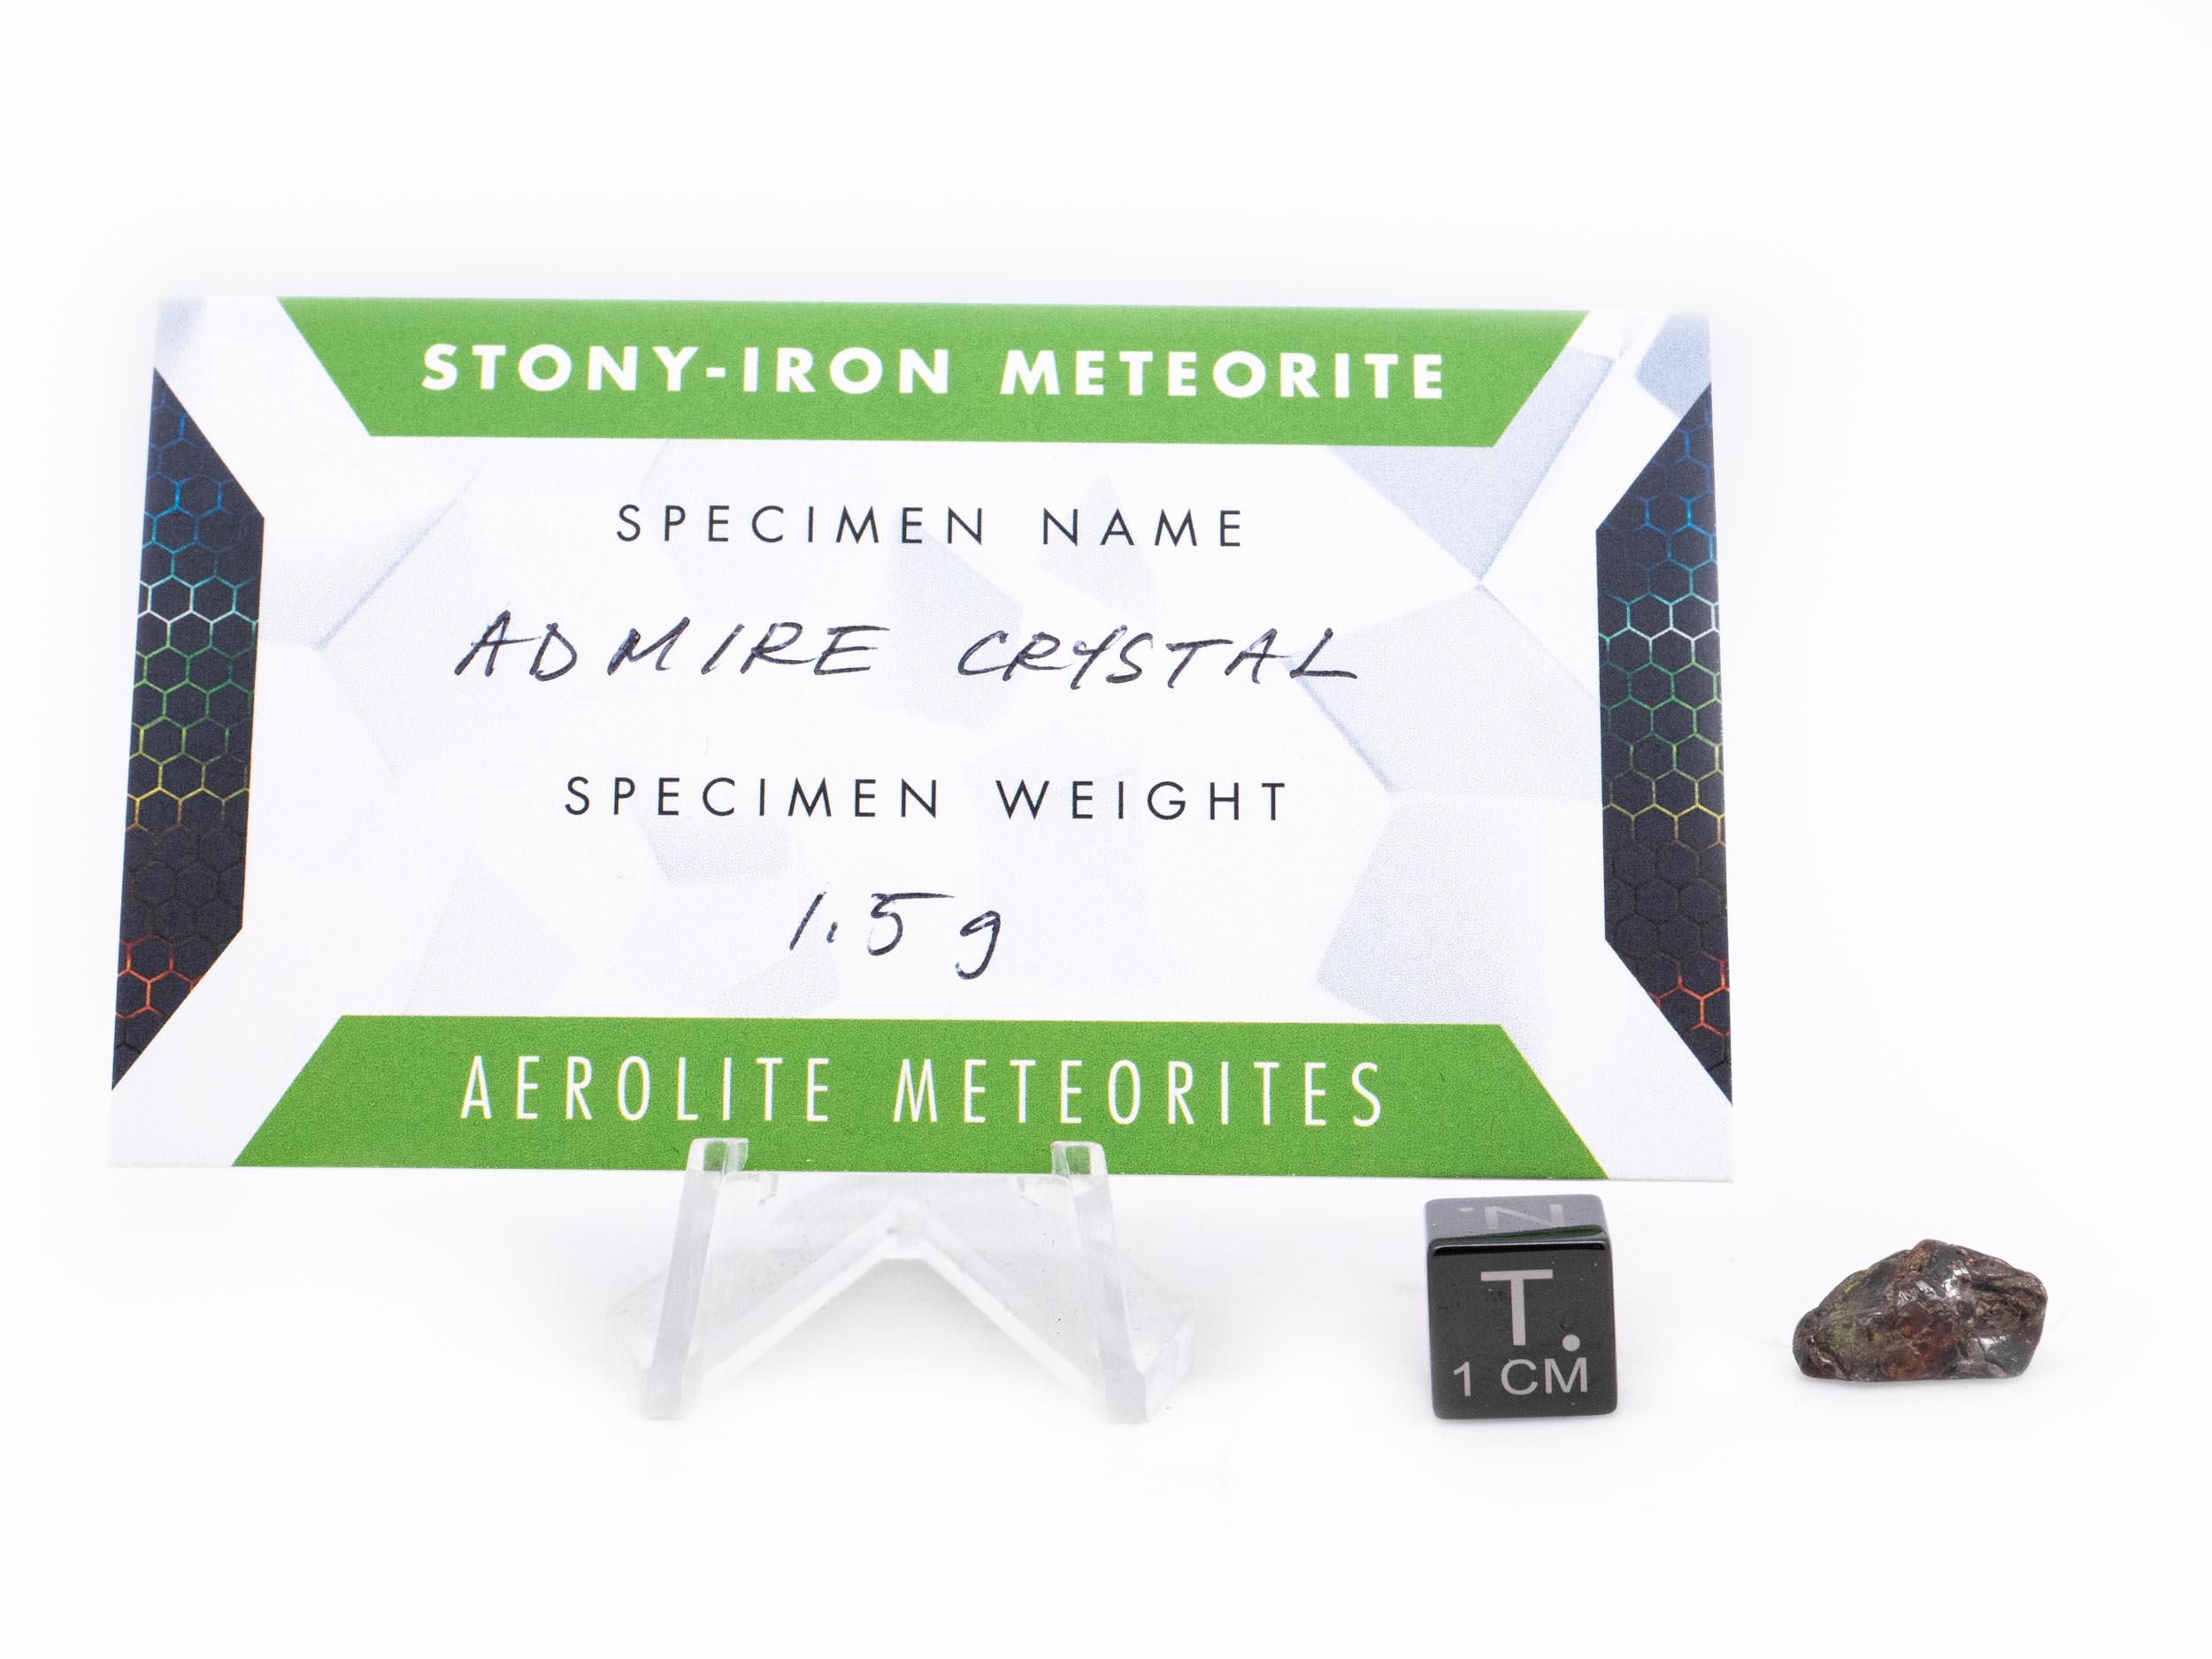 admire crystal 1 5 g 2